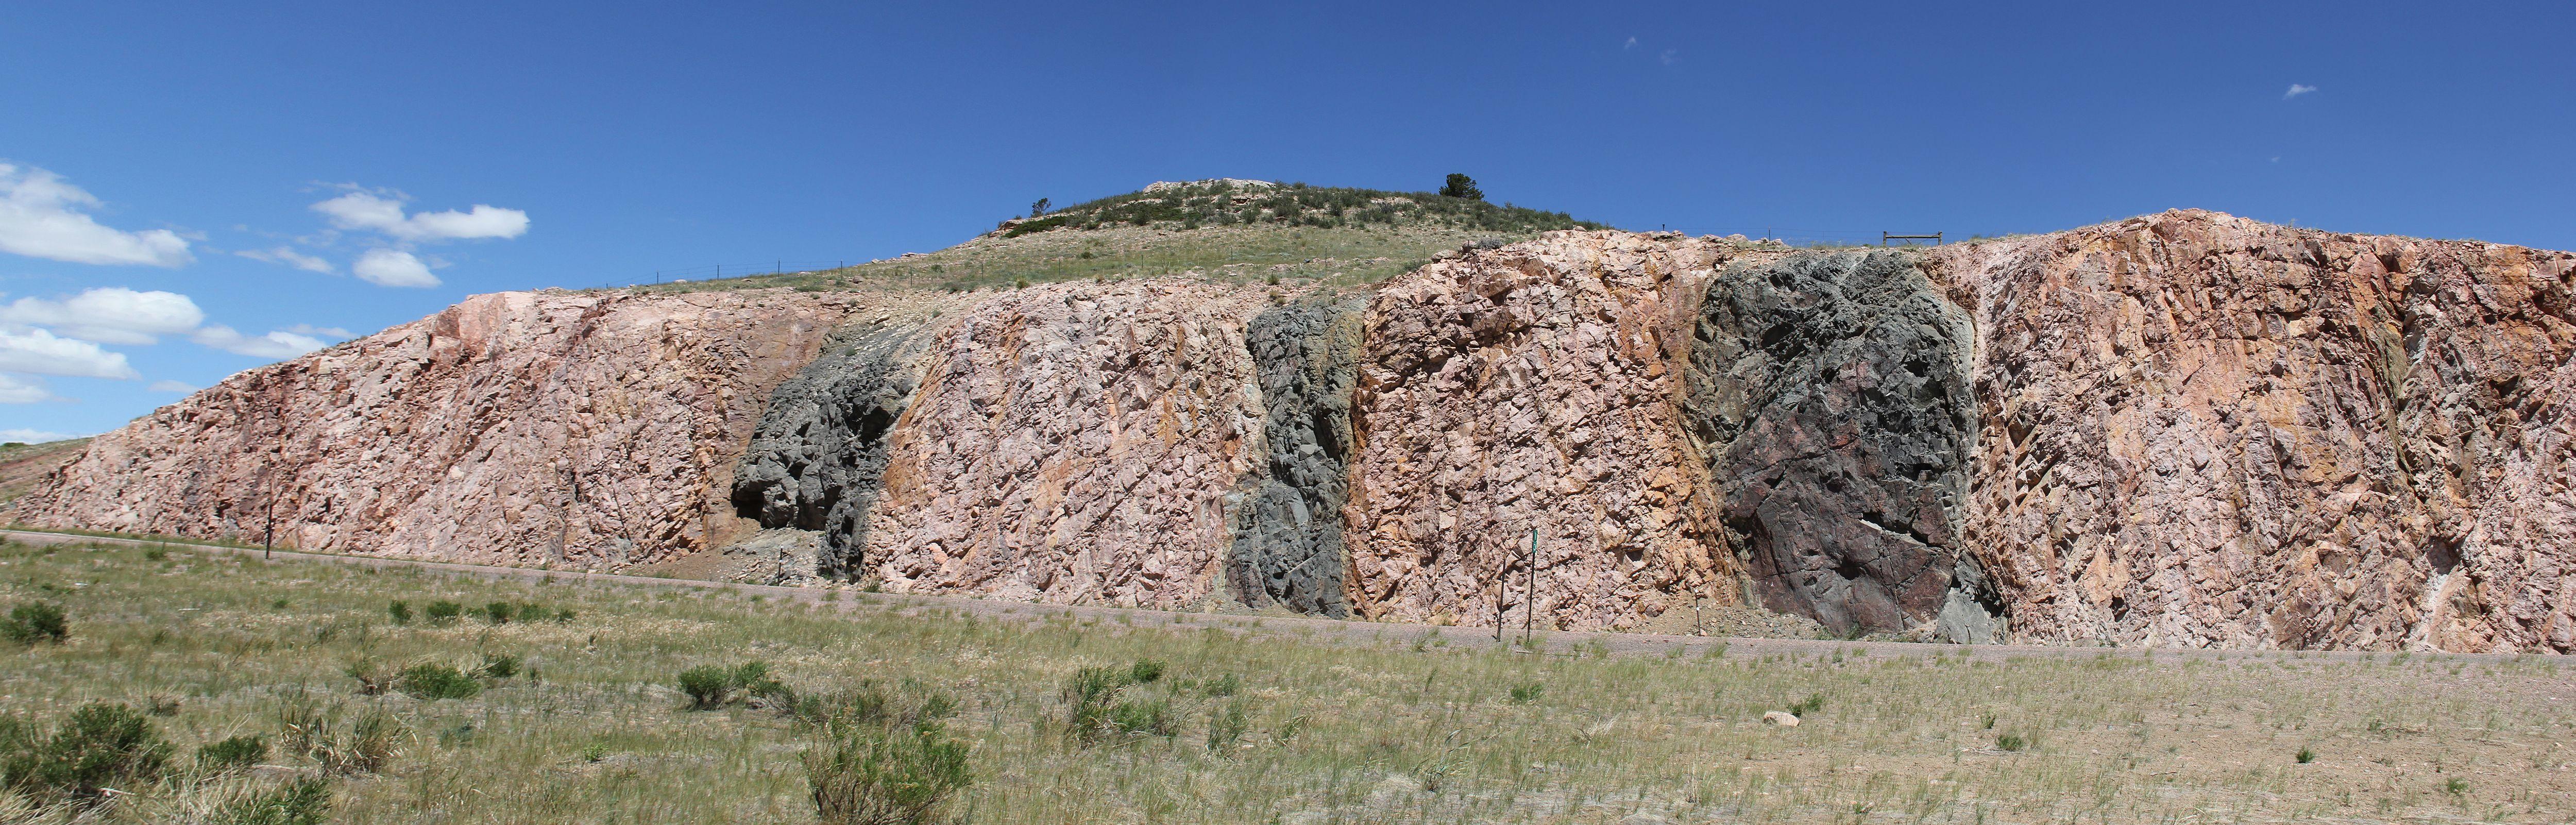 Laramie Range at Morton Pass, Wyoming.  Paleoproterozoic (ca. 2 bya) mafic dikes (dark) cross-cut an older Archean (ca. 2.7+ bya) granitic/gneissic complex (light). ...